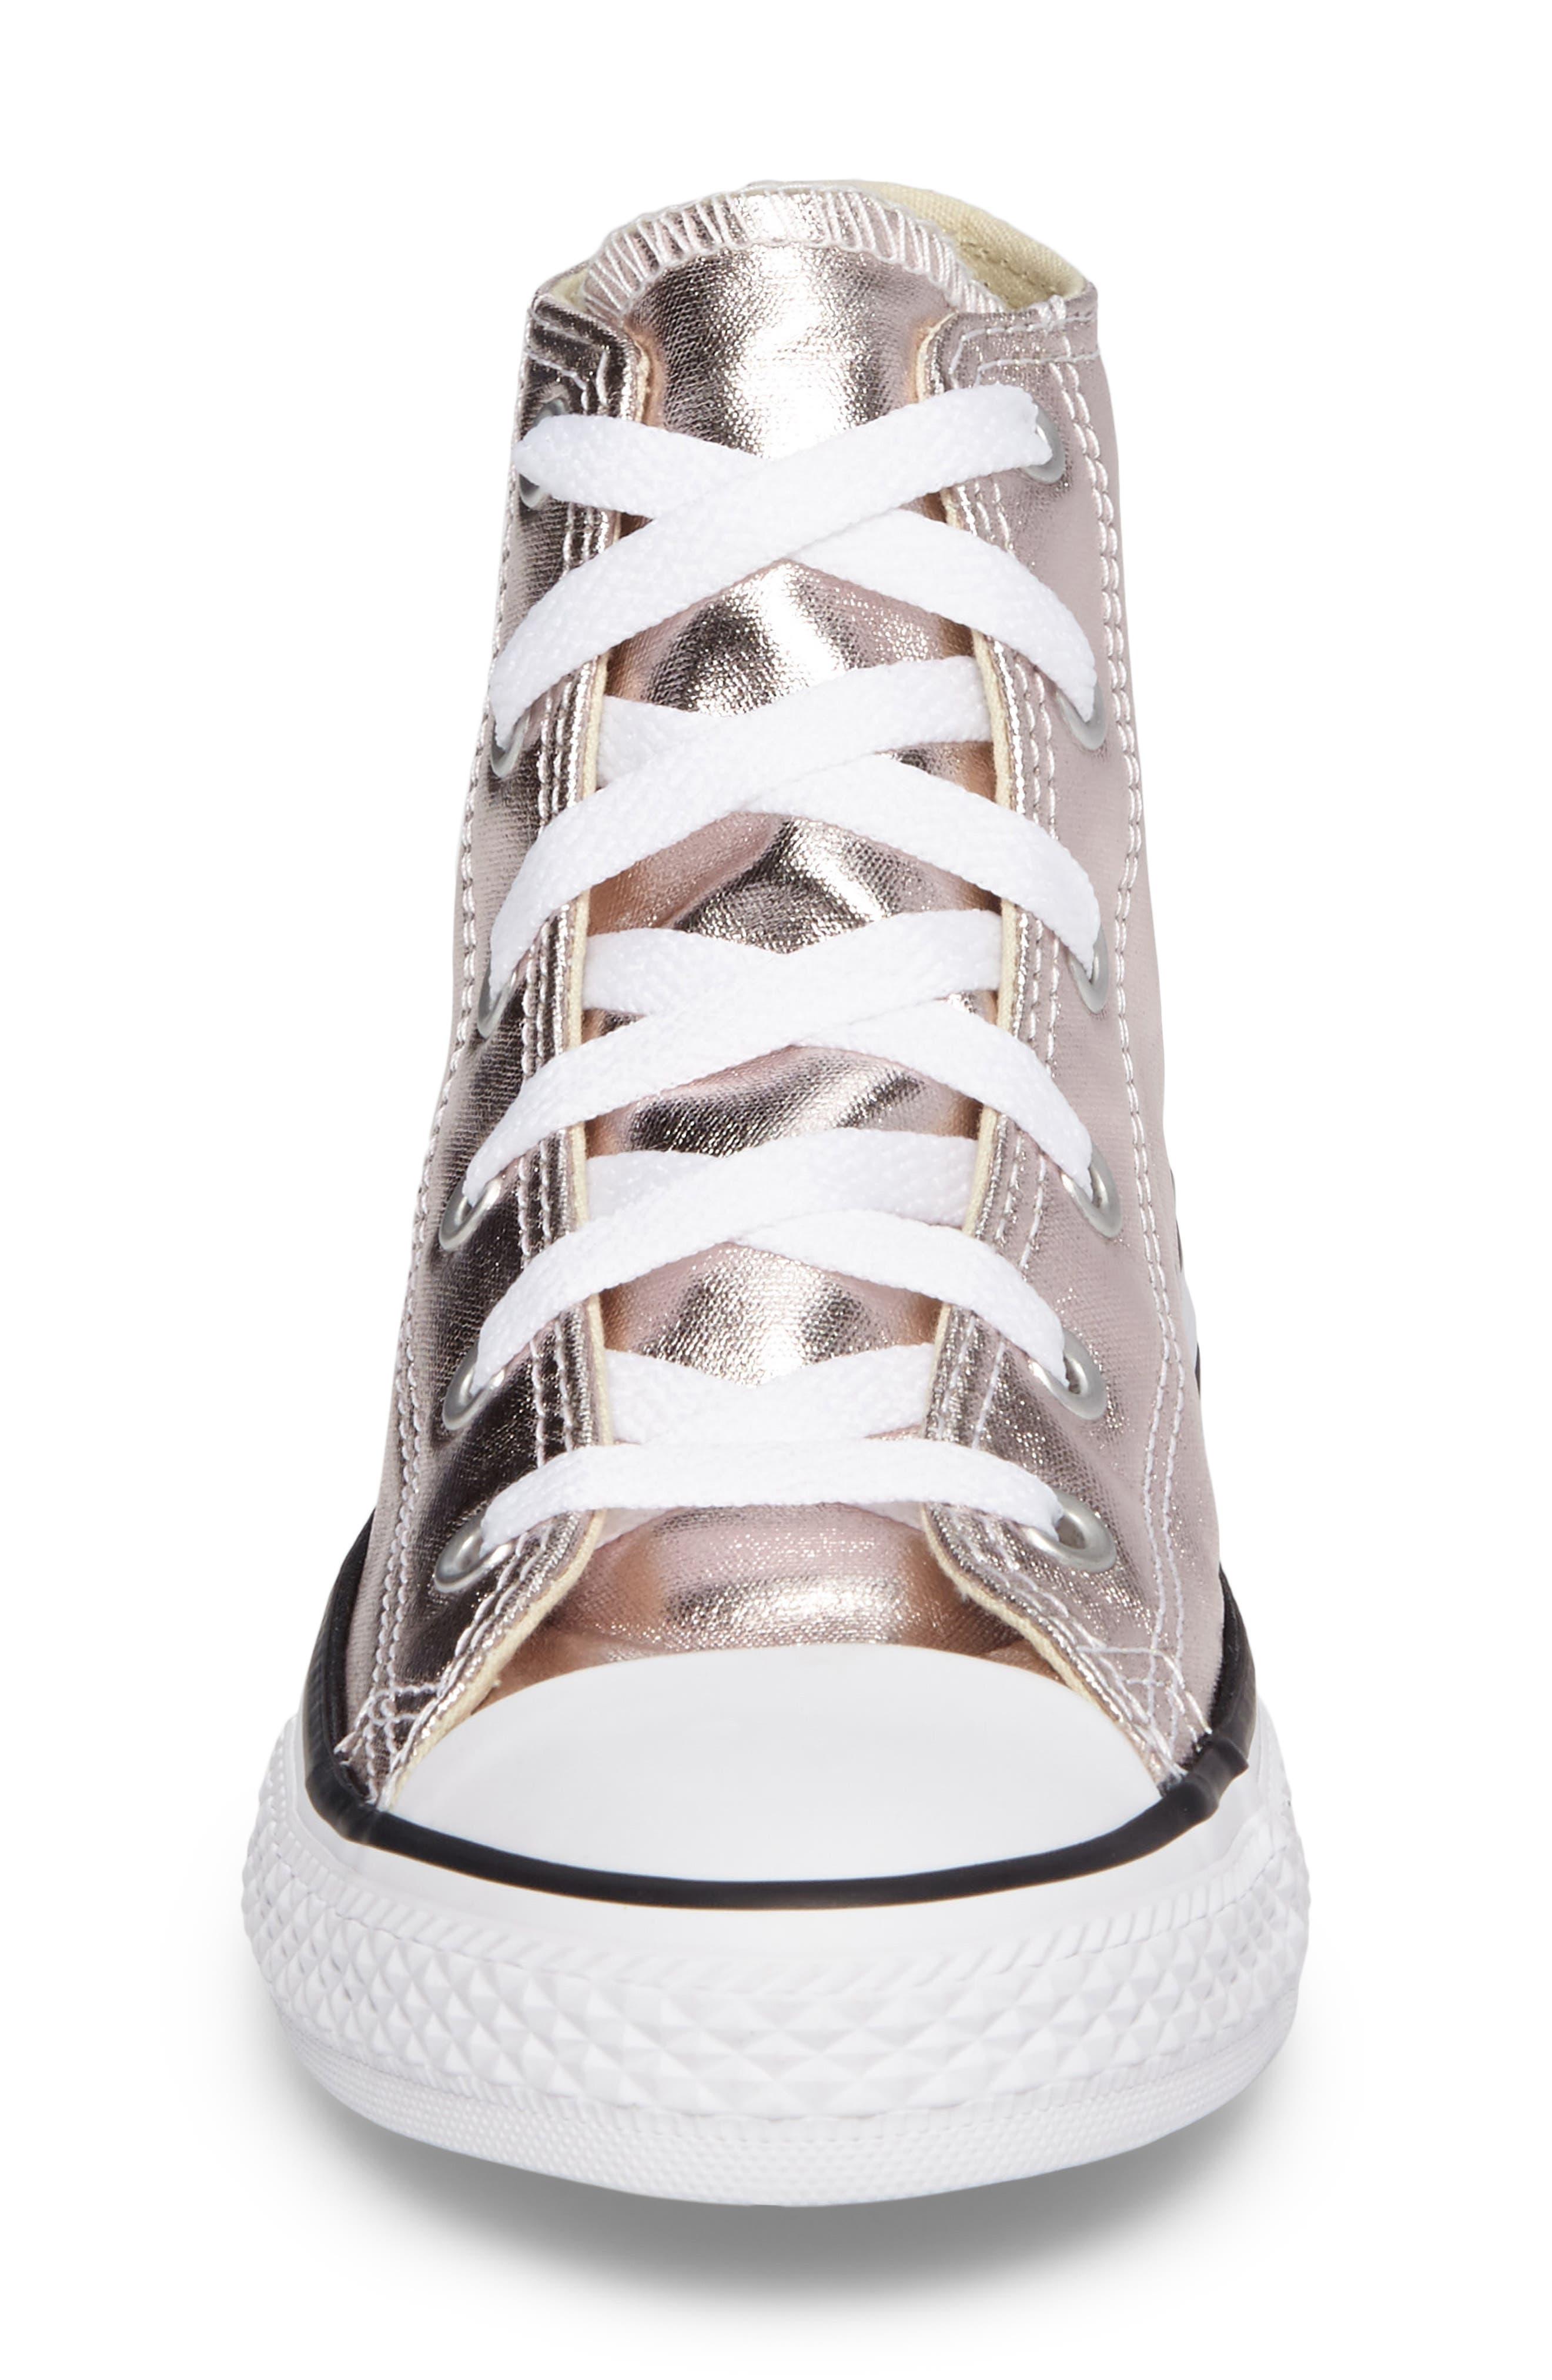 Chuck Taylor<sup>®</sup> All Star<sup>®</sup> Seasonal Metallic High Top Sneaker,                             Alternate thumbnail 4, color,                             221